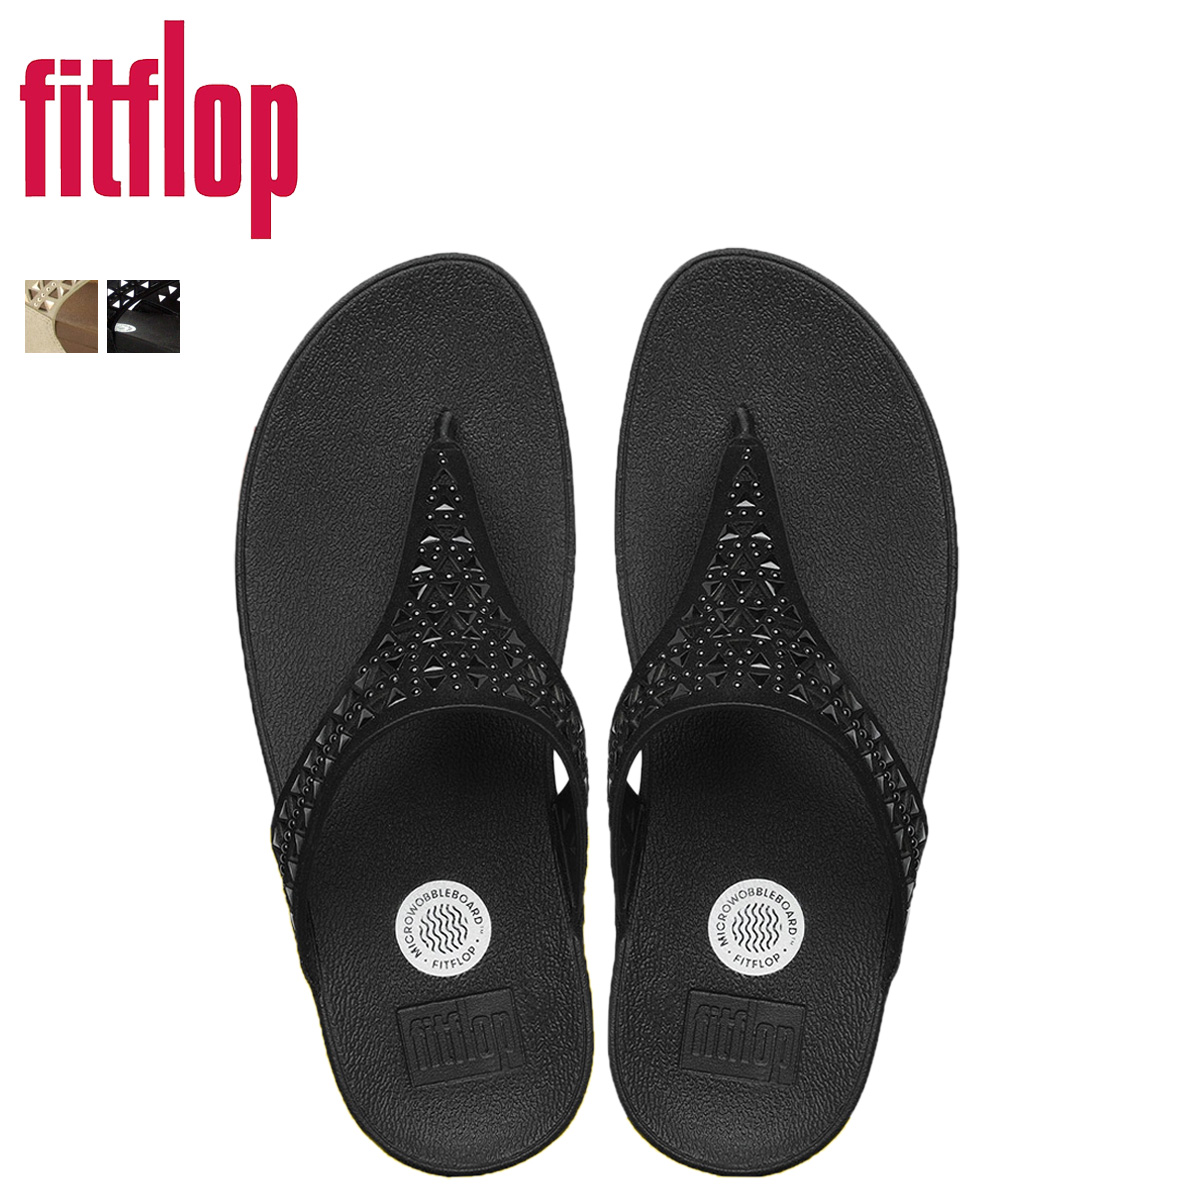 2f097bb4b488b Sugar online shop rakuten global market fitflop fit flop carmel sandals  carmel suede toe ladies jpg